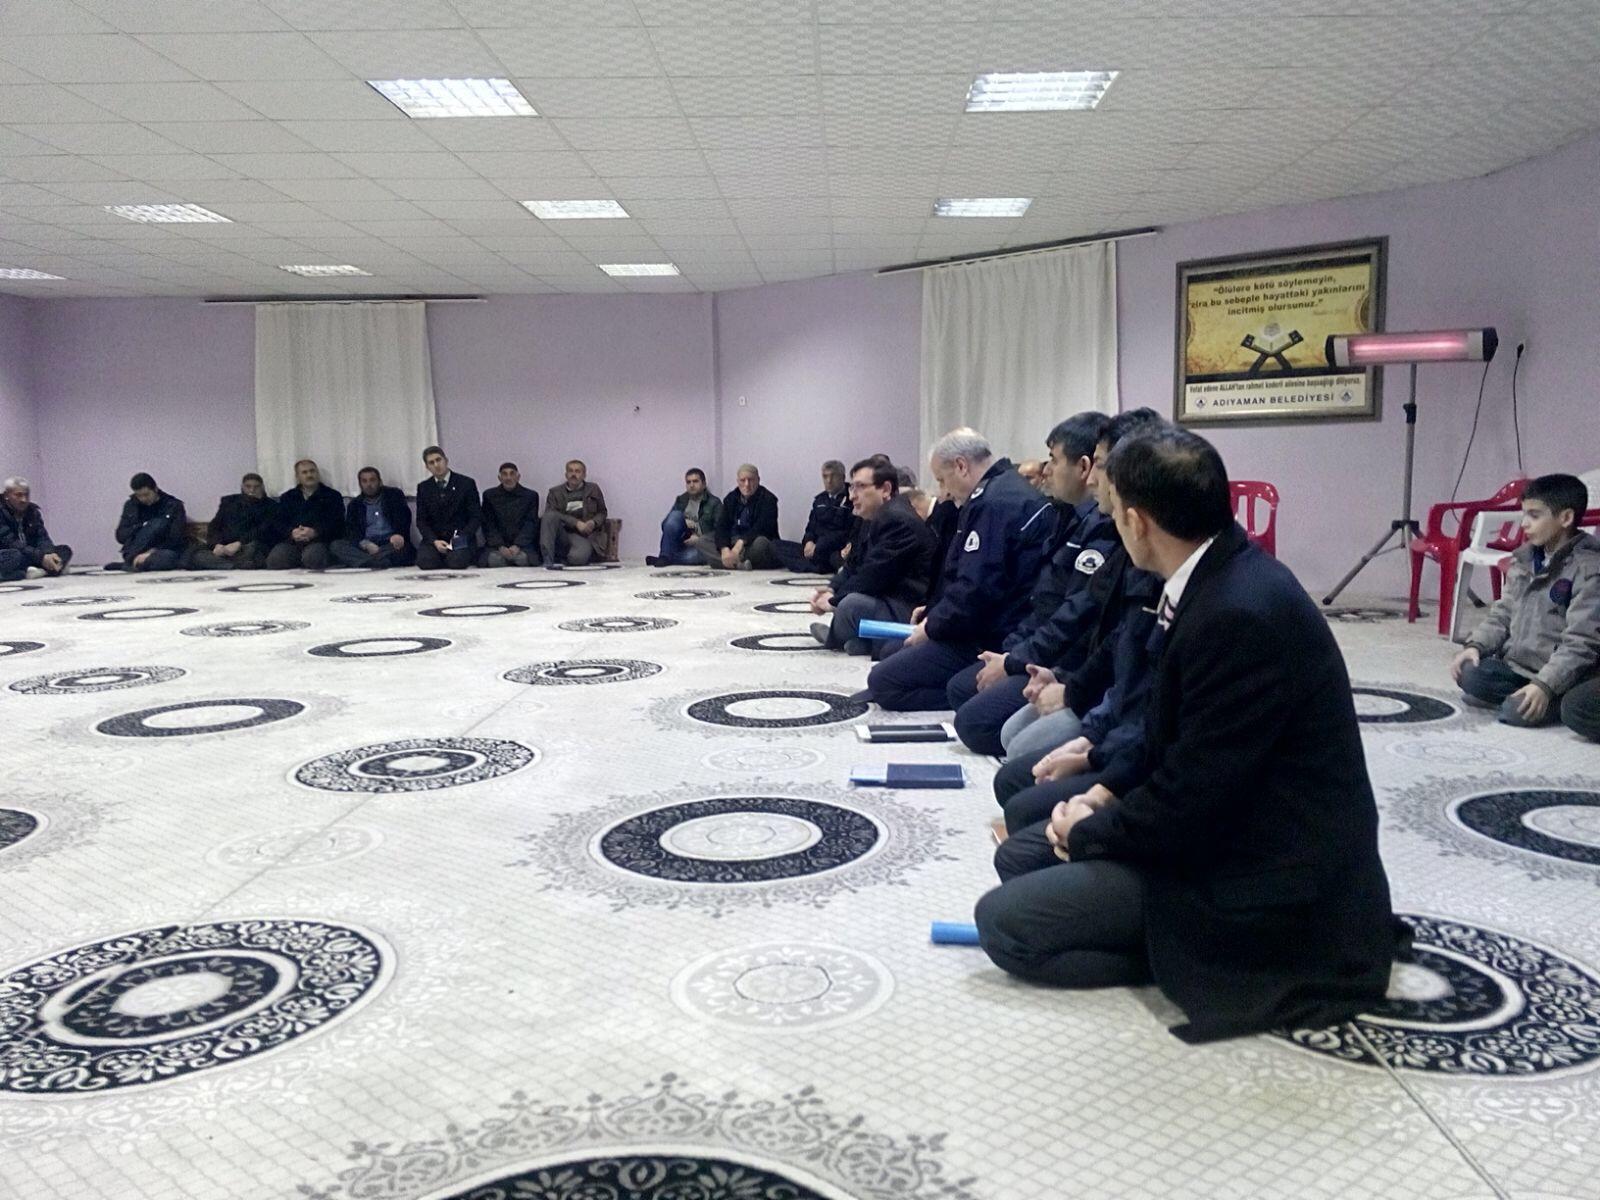 ADIYAMAN EMNİYET MÜDÜRLÜĞÜ 'HUZUR TOPLANTISI' YAPTI.